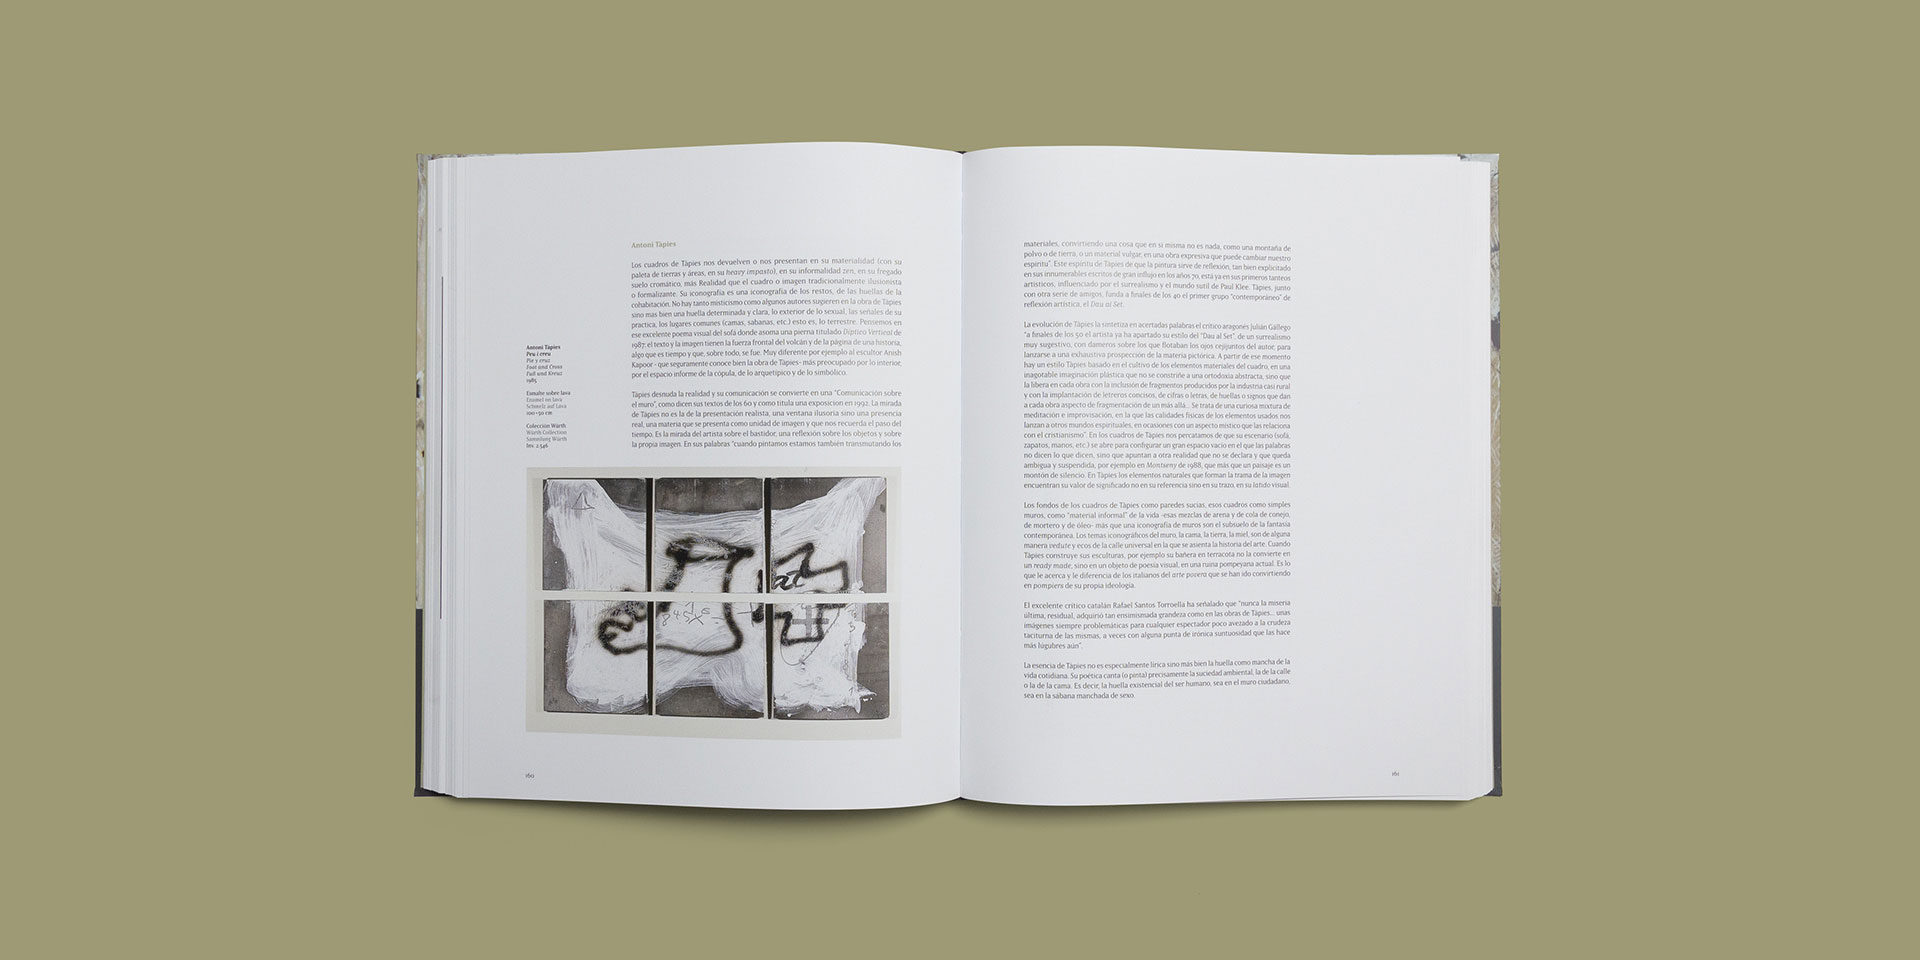 Diseño catálogo 'Arte Español Museo Würth La Rioja' by Óscar Ortega Quesada - Creative Work - $i